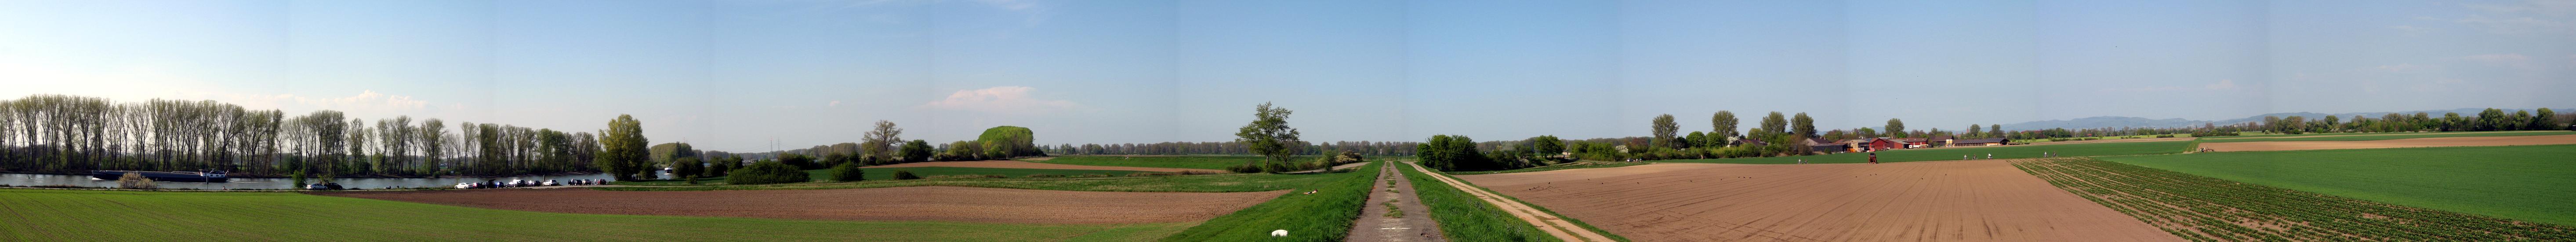 Rhein-Radweg